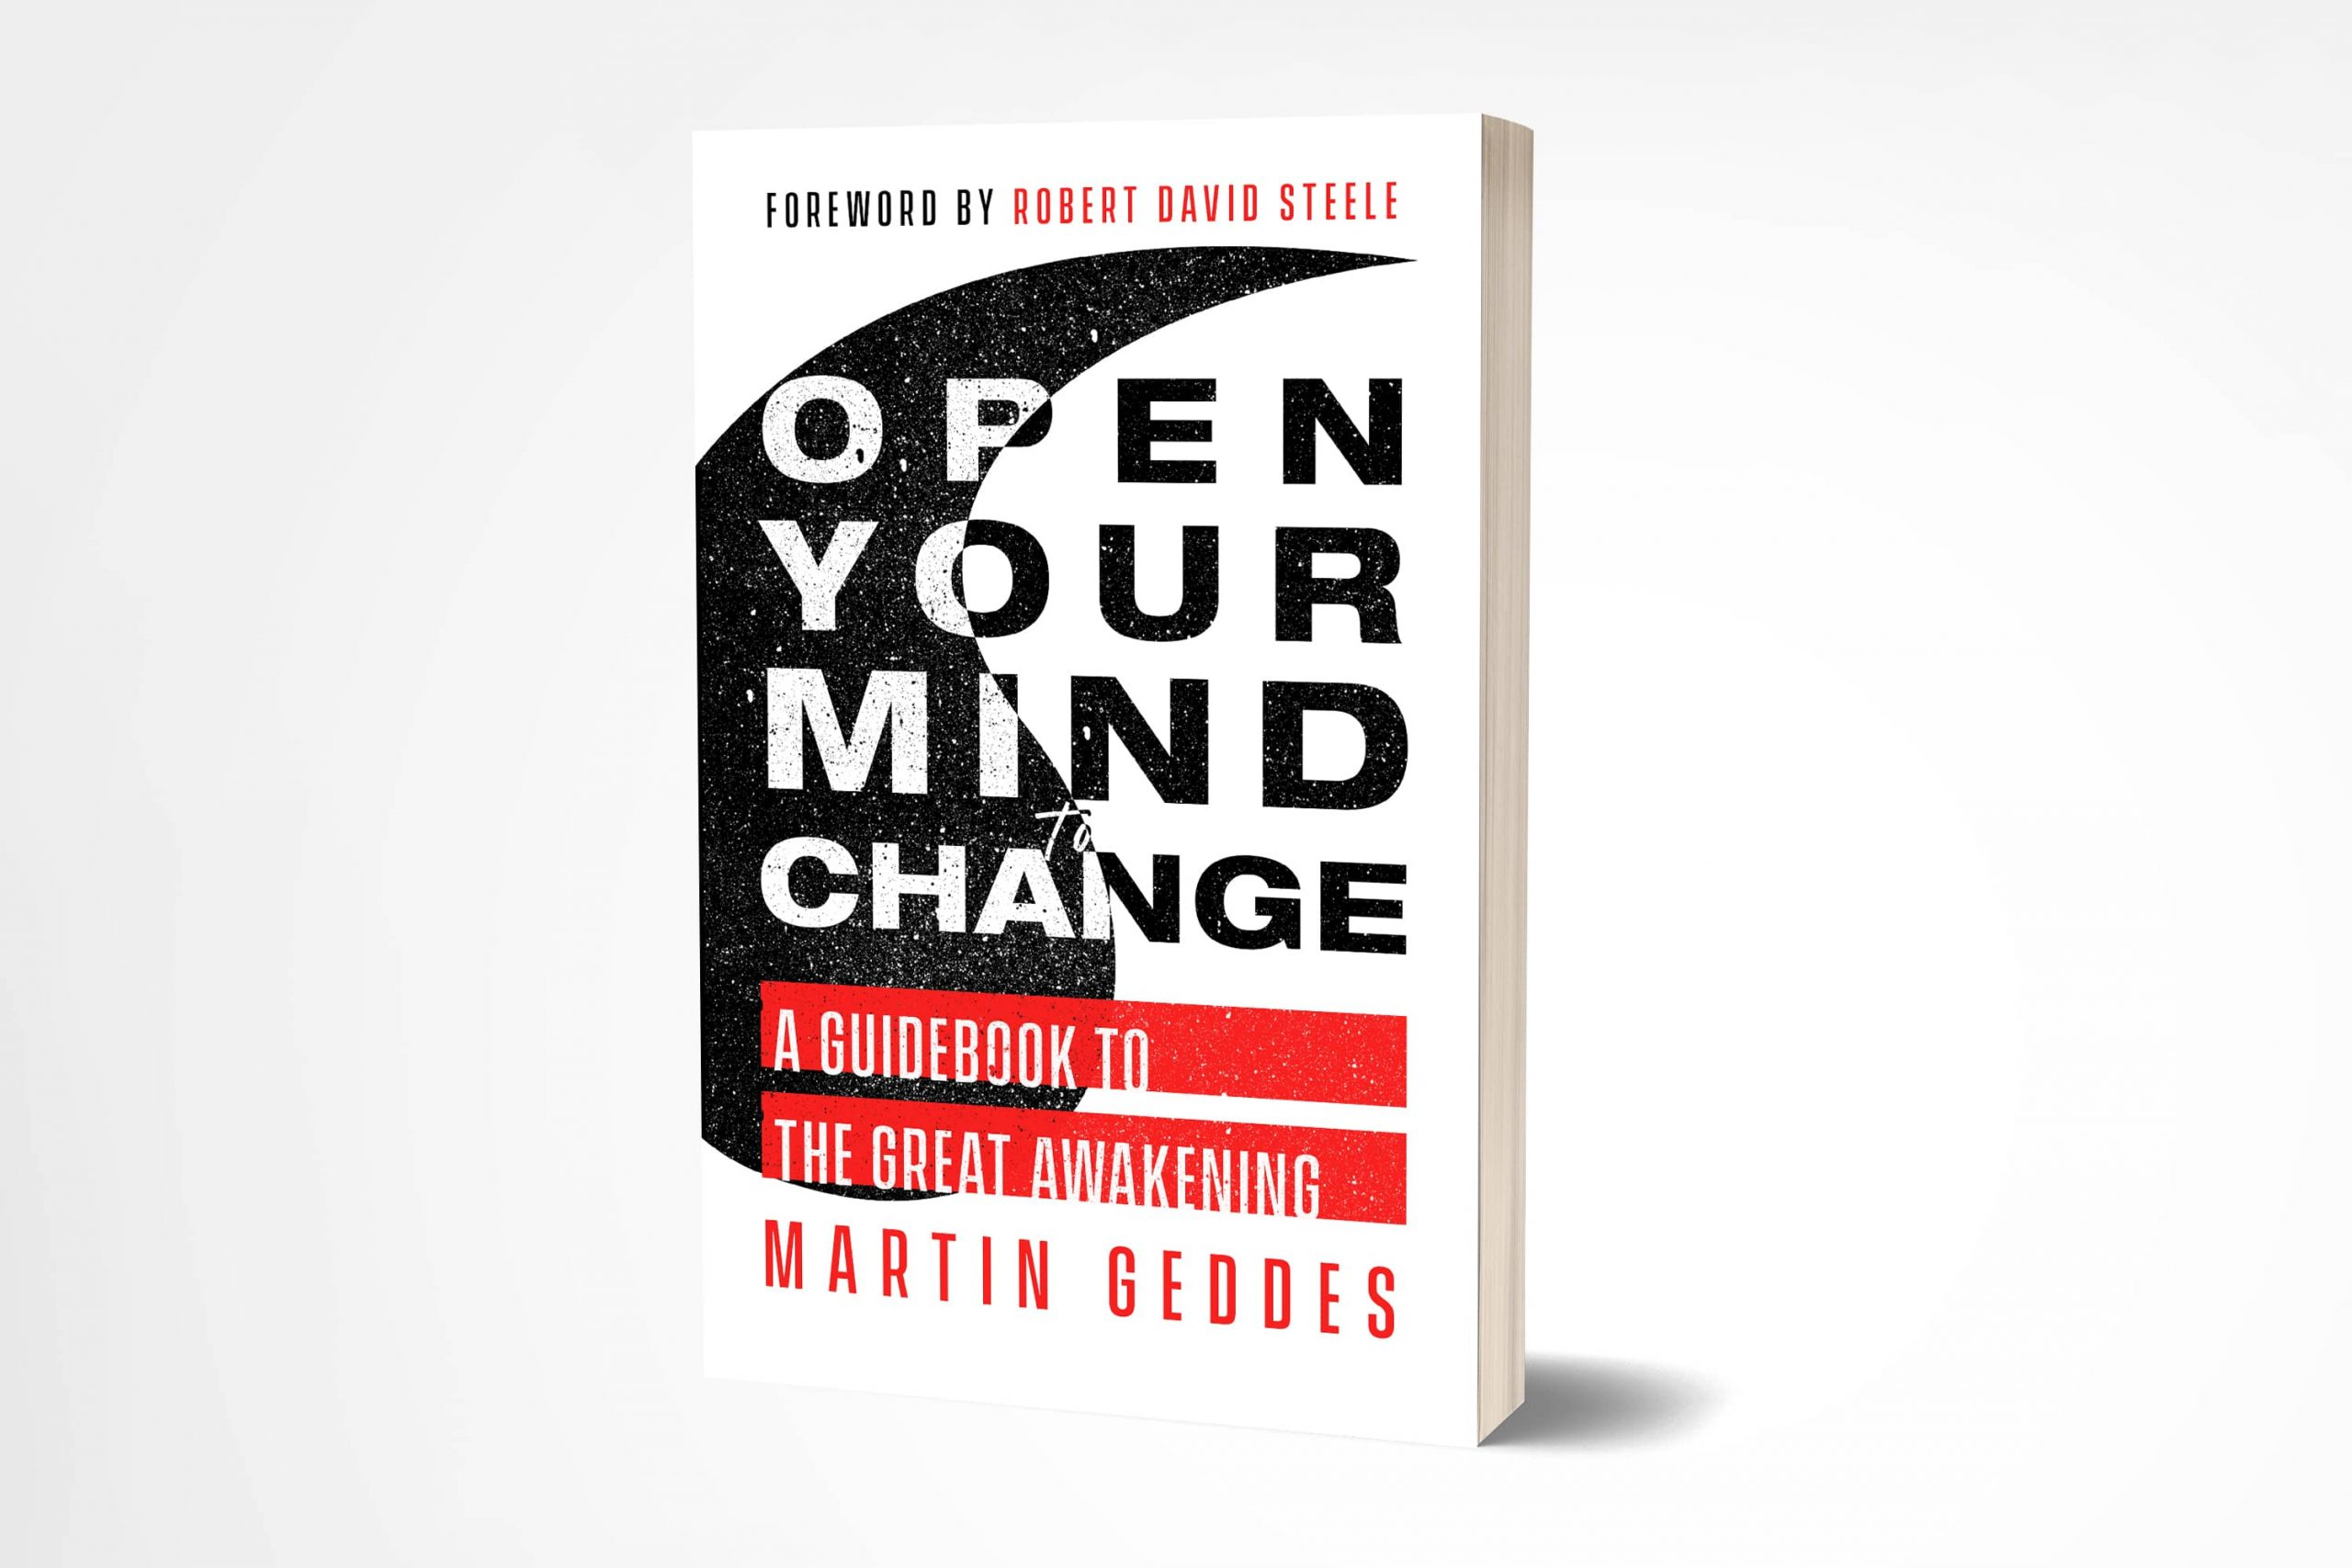 Martin Geddes Open Your Mind To Change